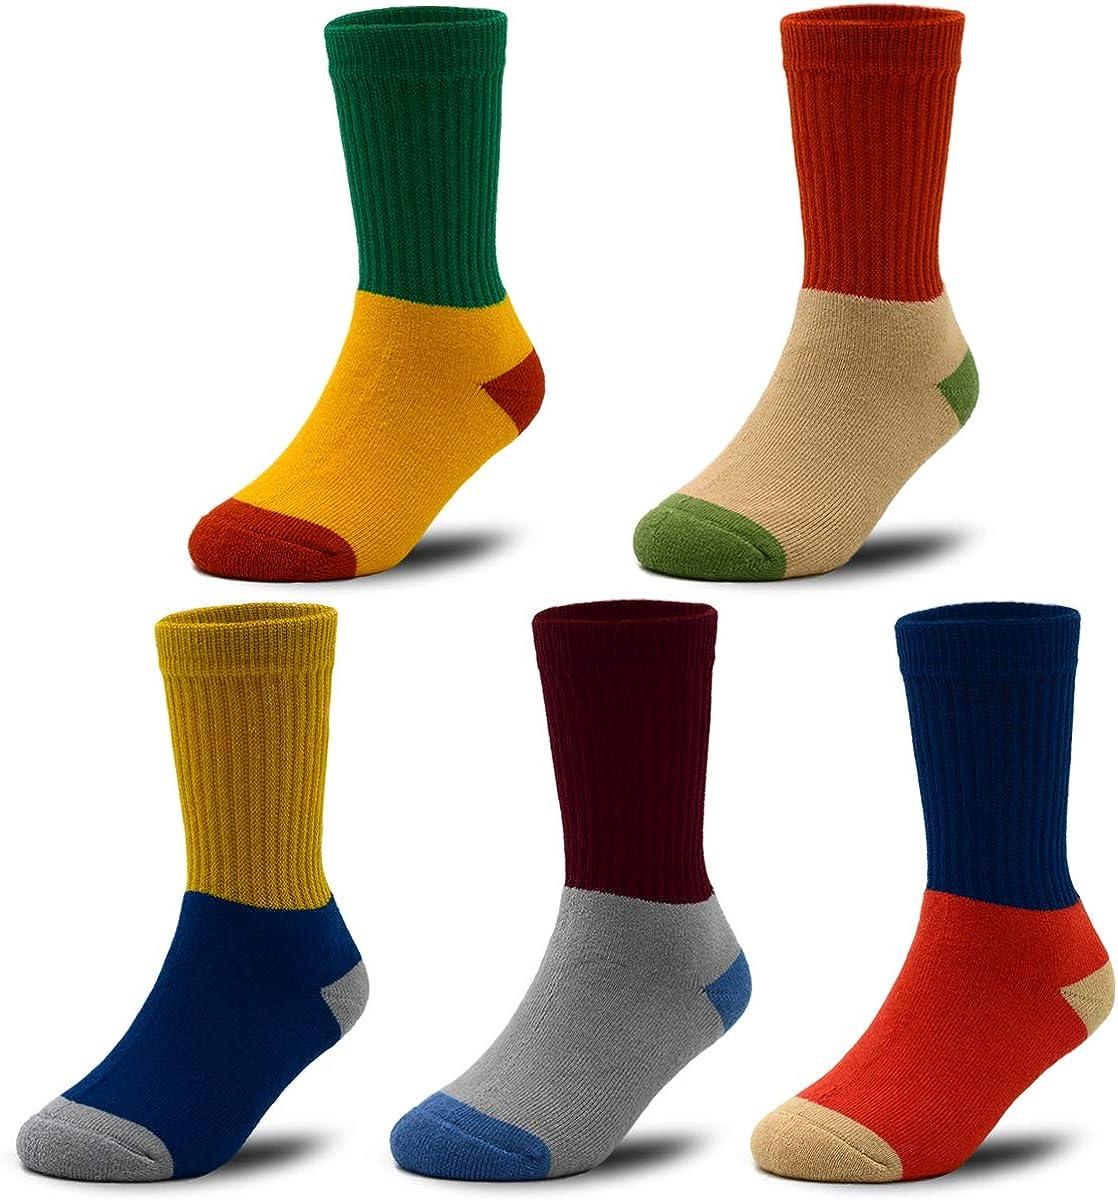 Boys' Thick Cotton Socks Kids Winter Warm Thermal Socks 5-Pack